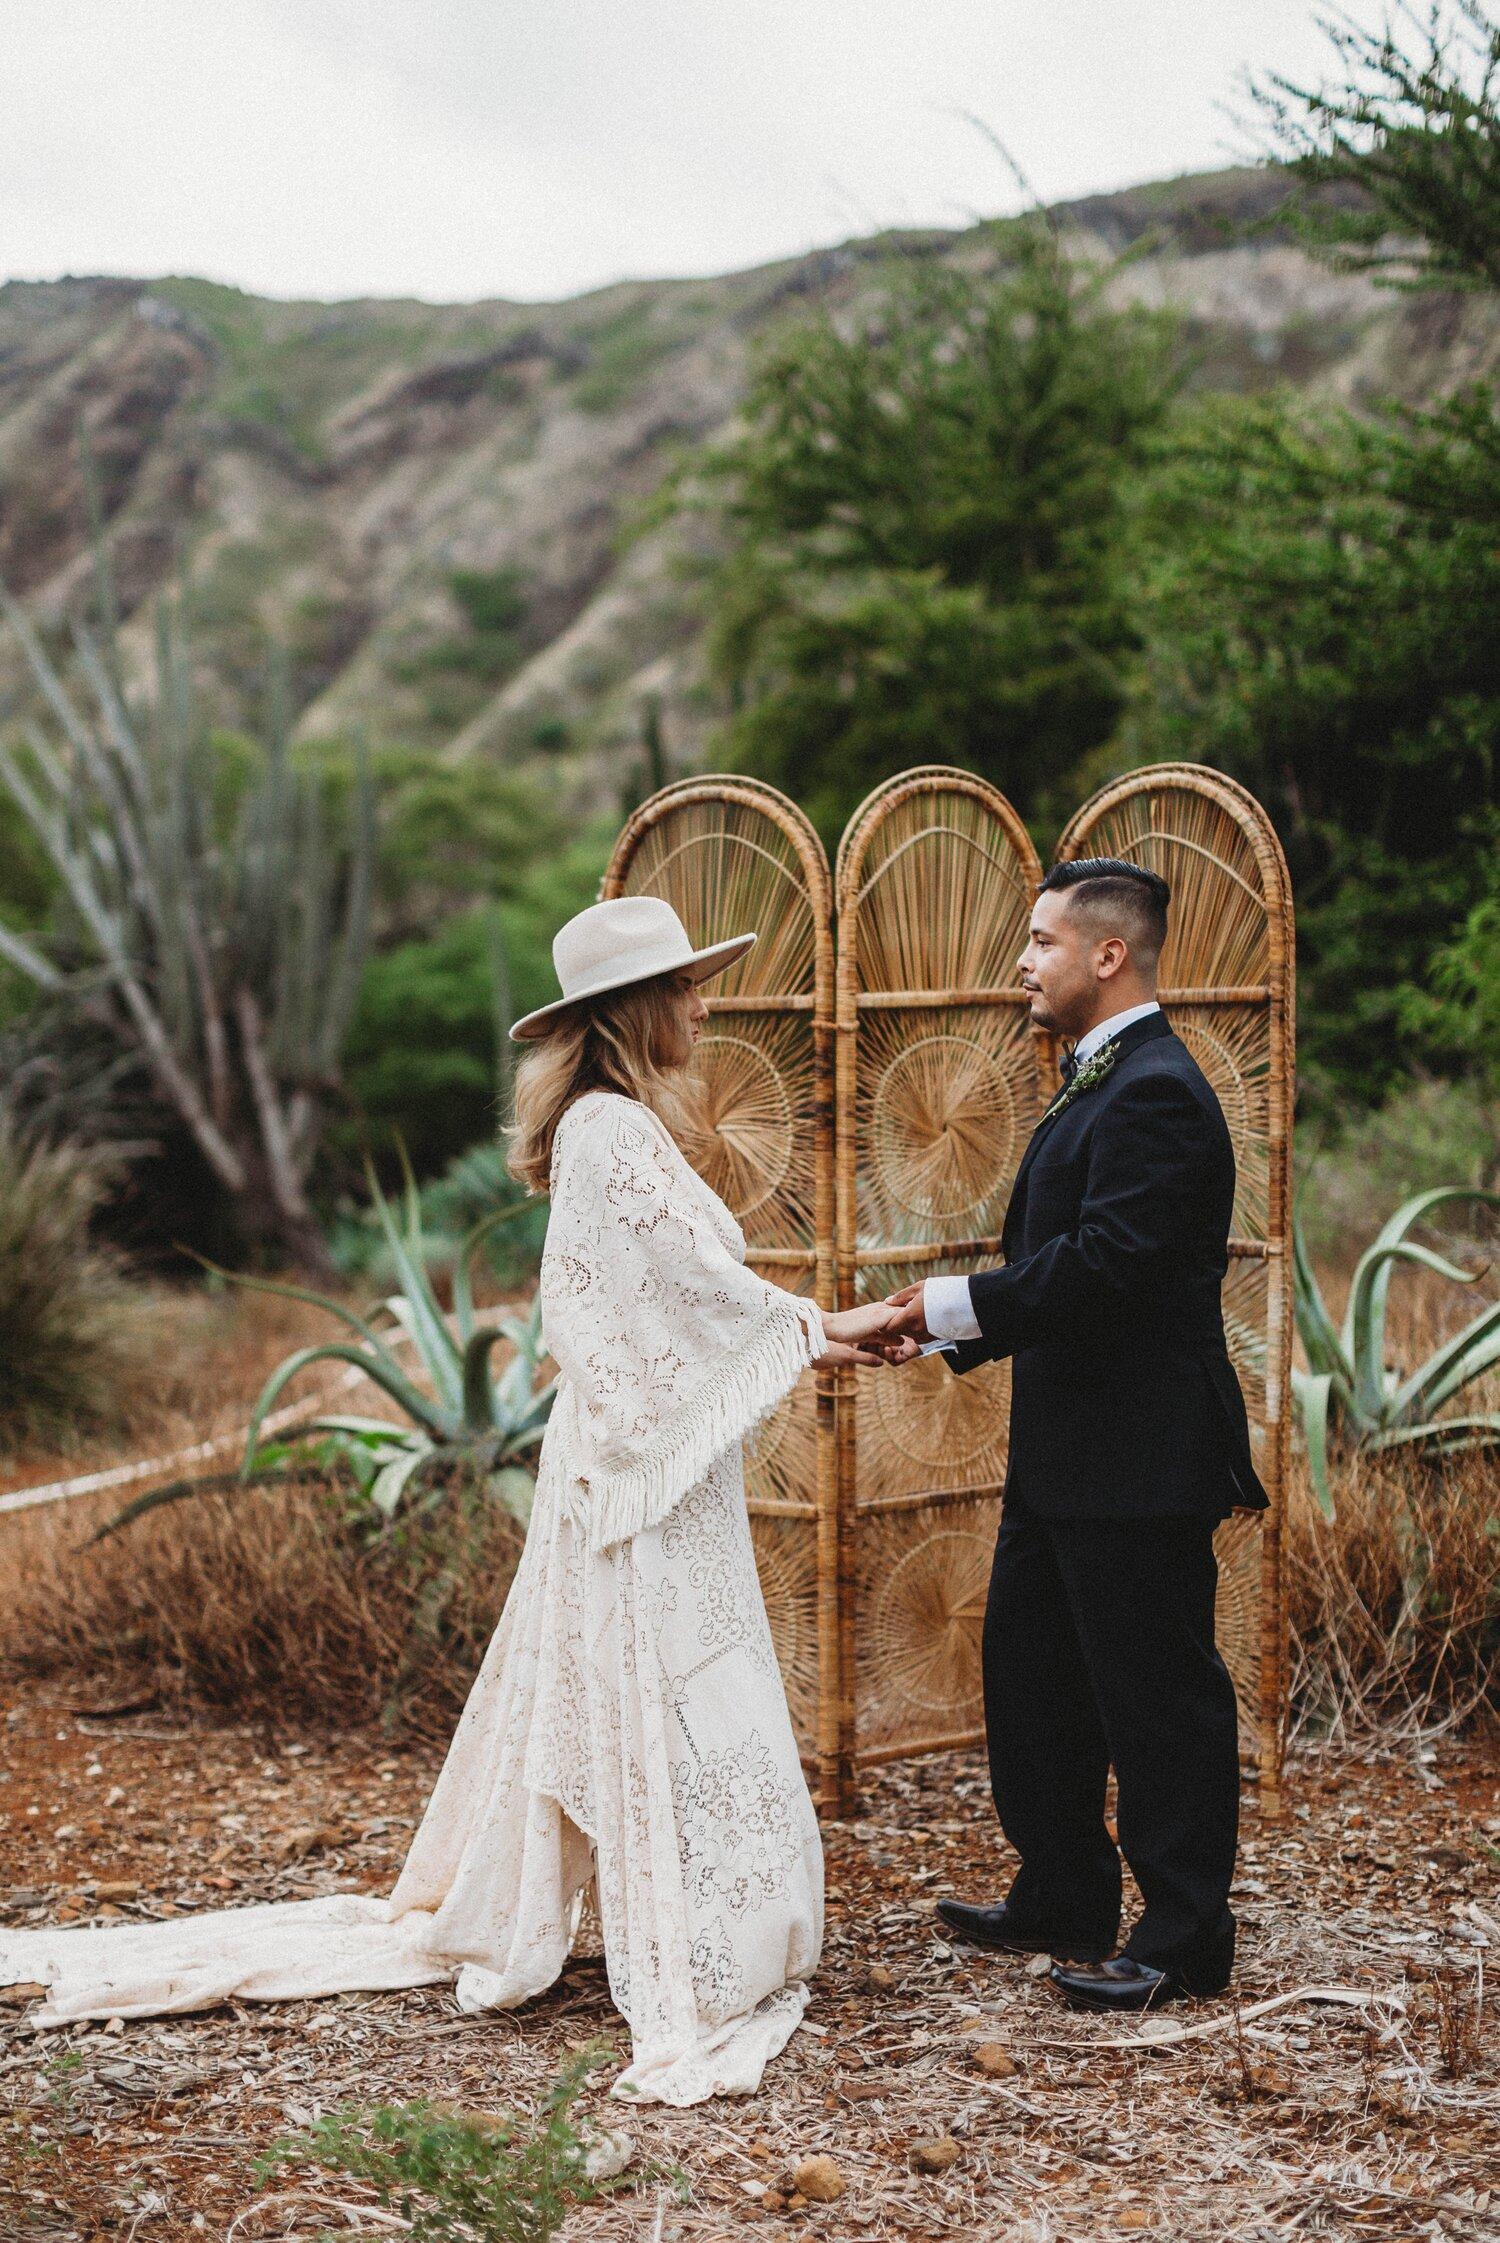 Boho Cactus Elopement - Honolulu, Koko Crater Botanical Garden - Oahu Hawaii Wedding Photographer 16.jpg